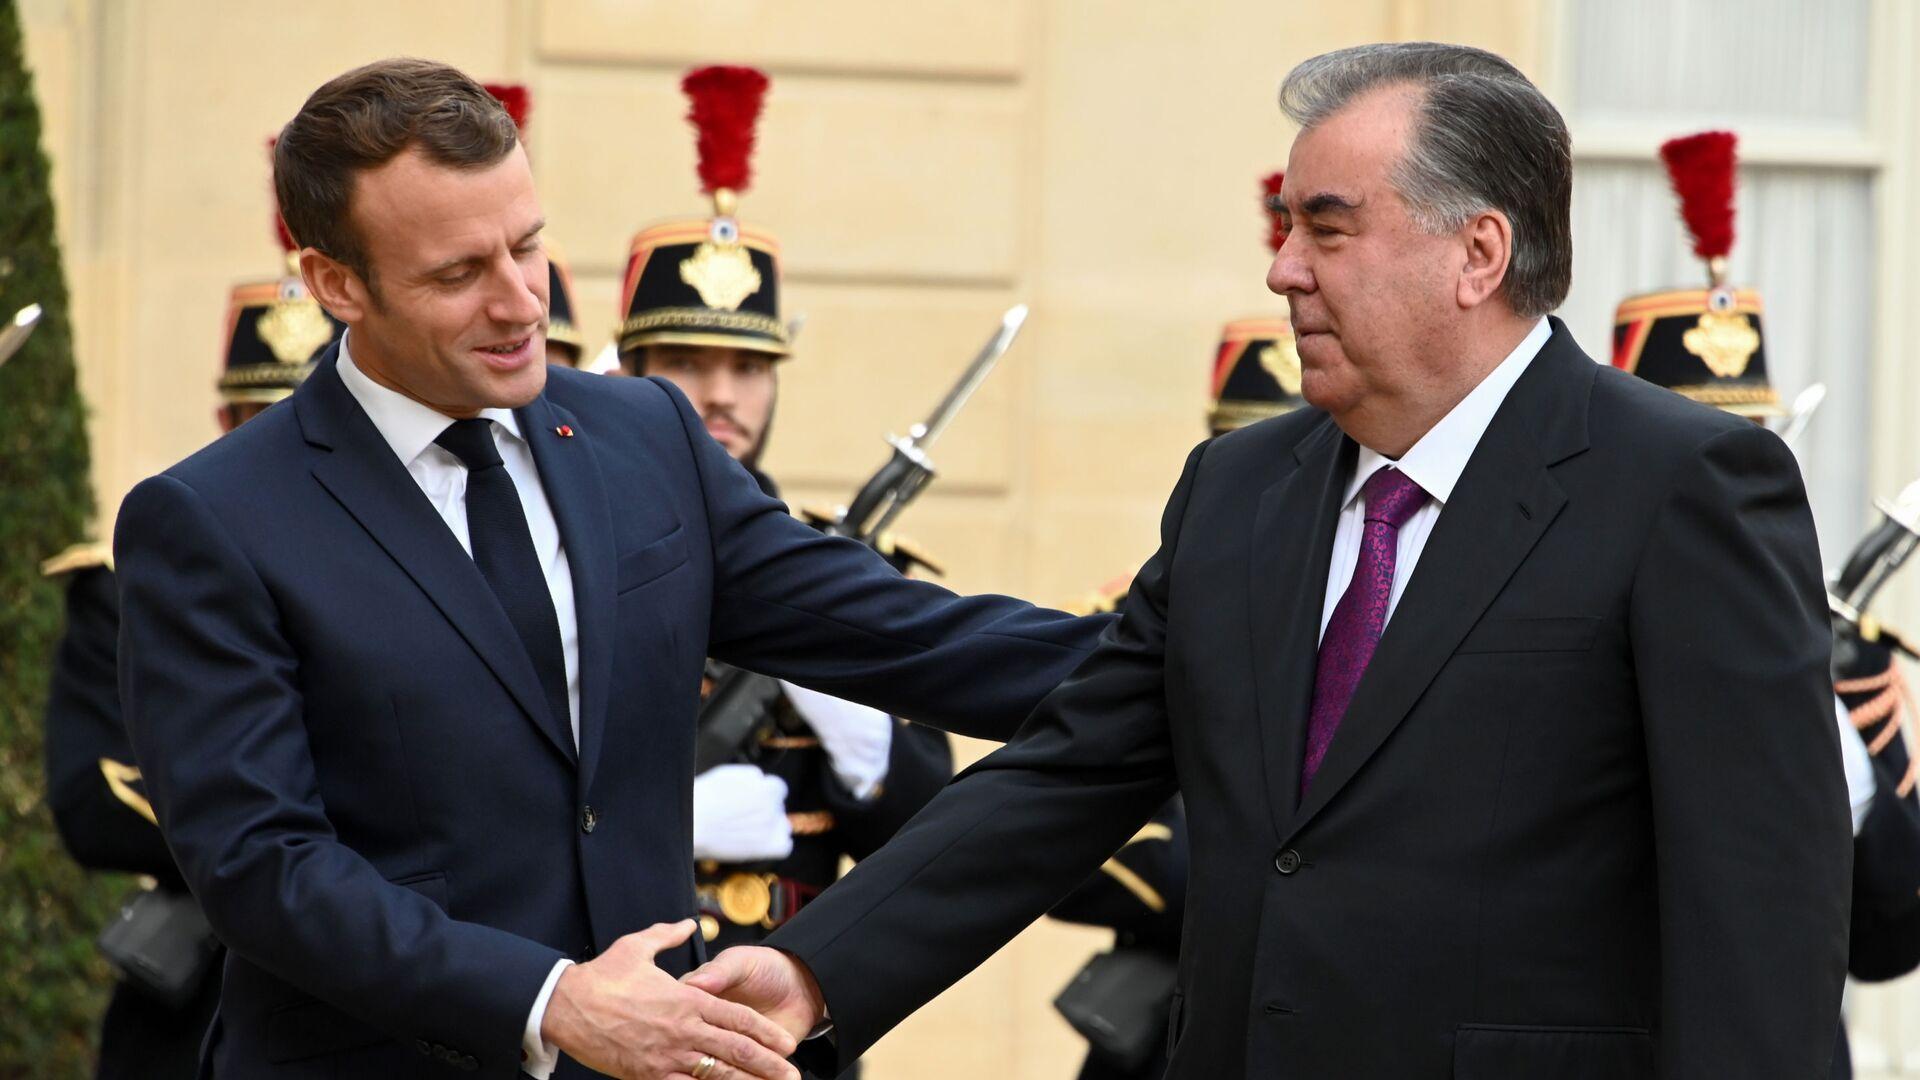 Президент Франции Эммануэль Макрон и президент Таджикистана Эмомали Рахмон  - Sputnik Таджикистан, 1920, 26.08.2021